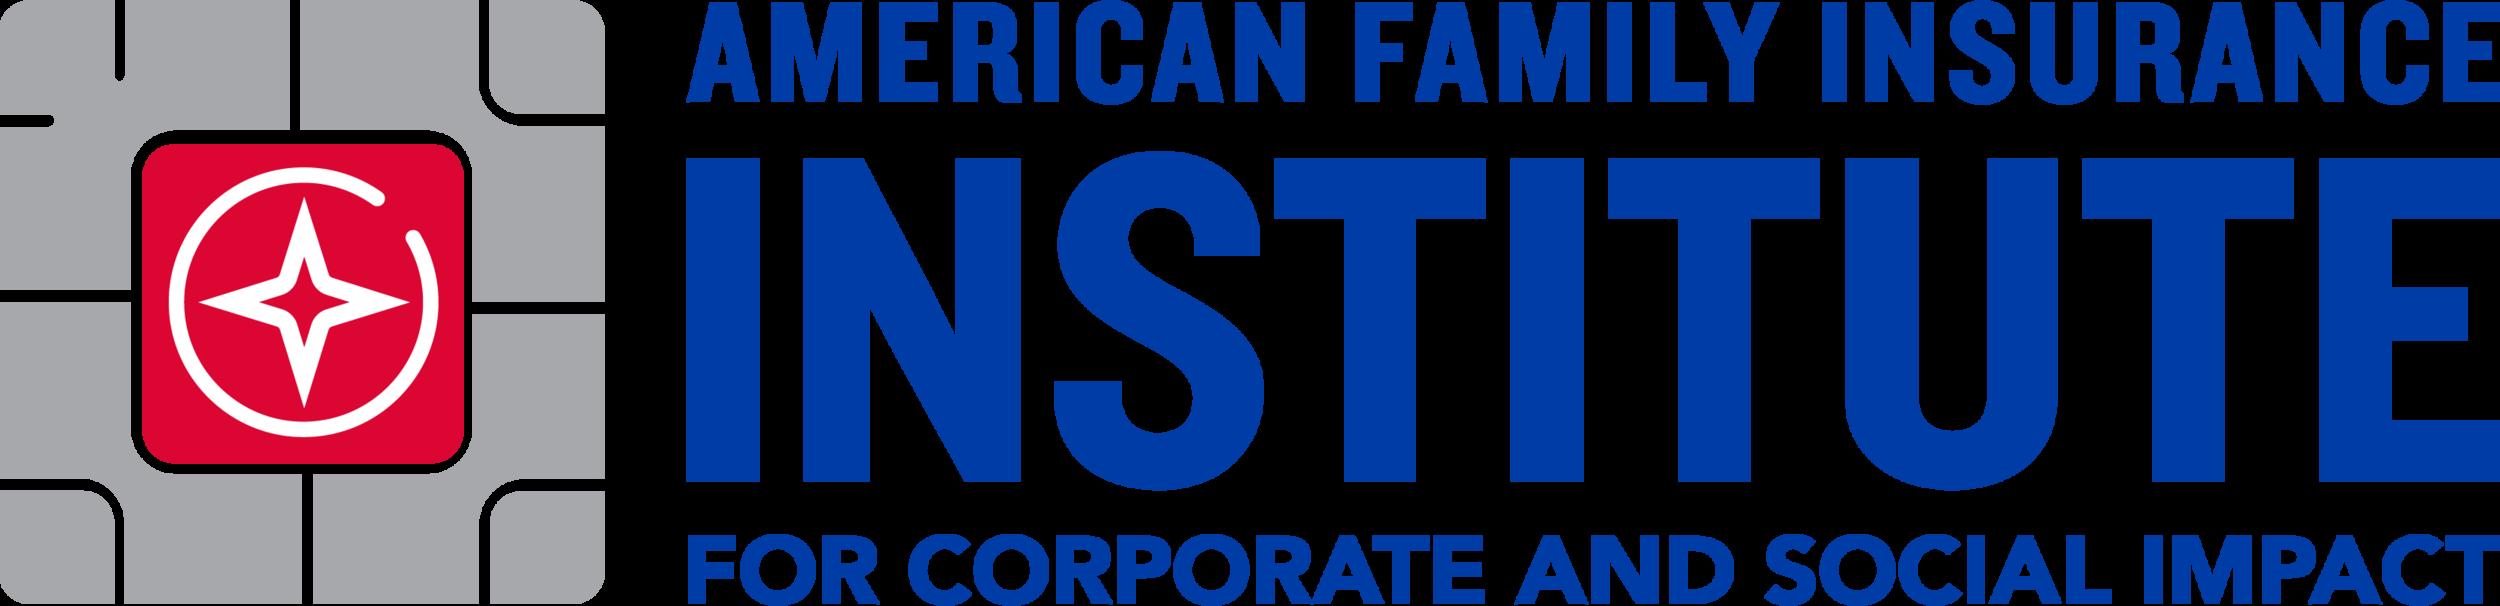 American Family Insurane Institute.png